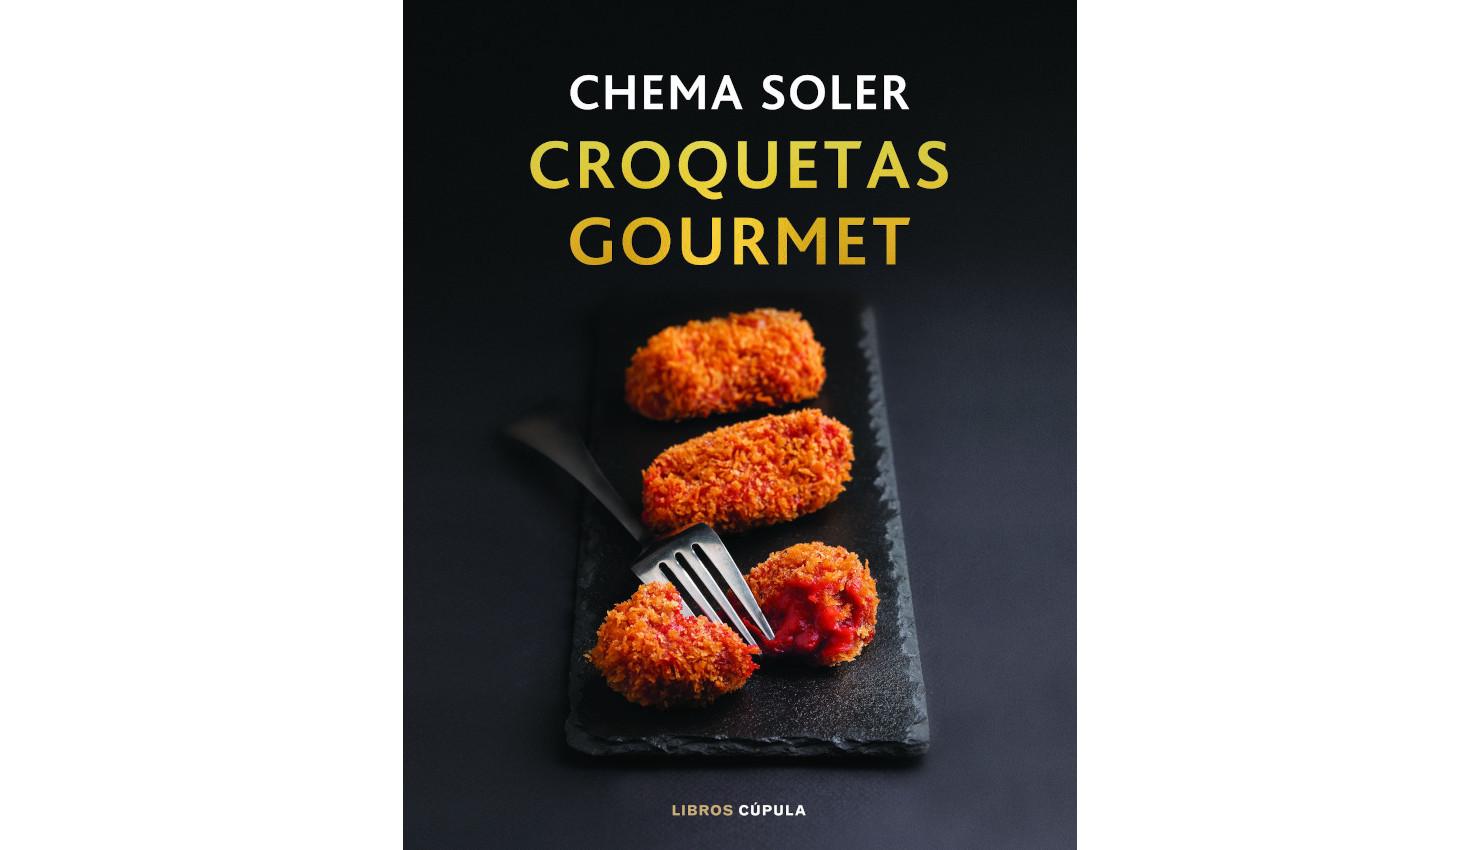 croquetas-gourmet-chema-soler-magazine-horse.jpg